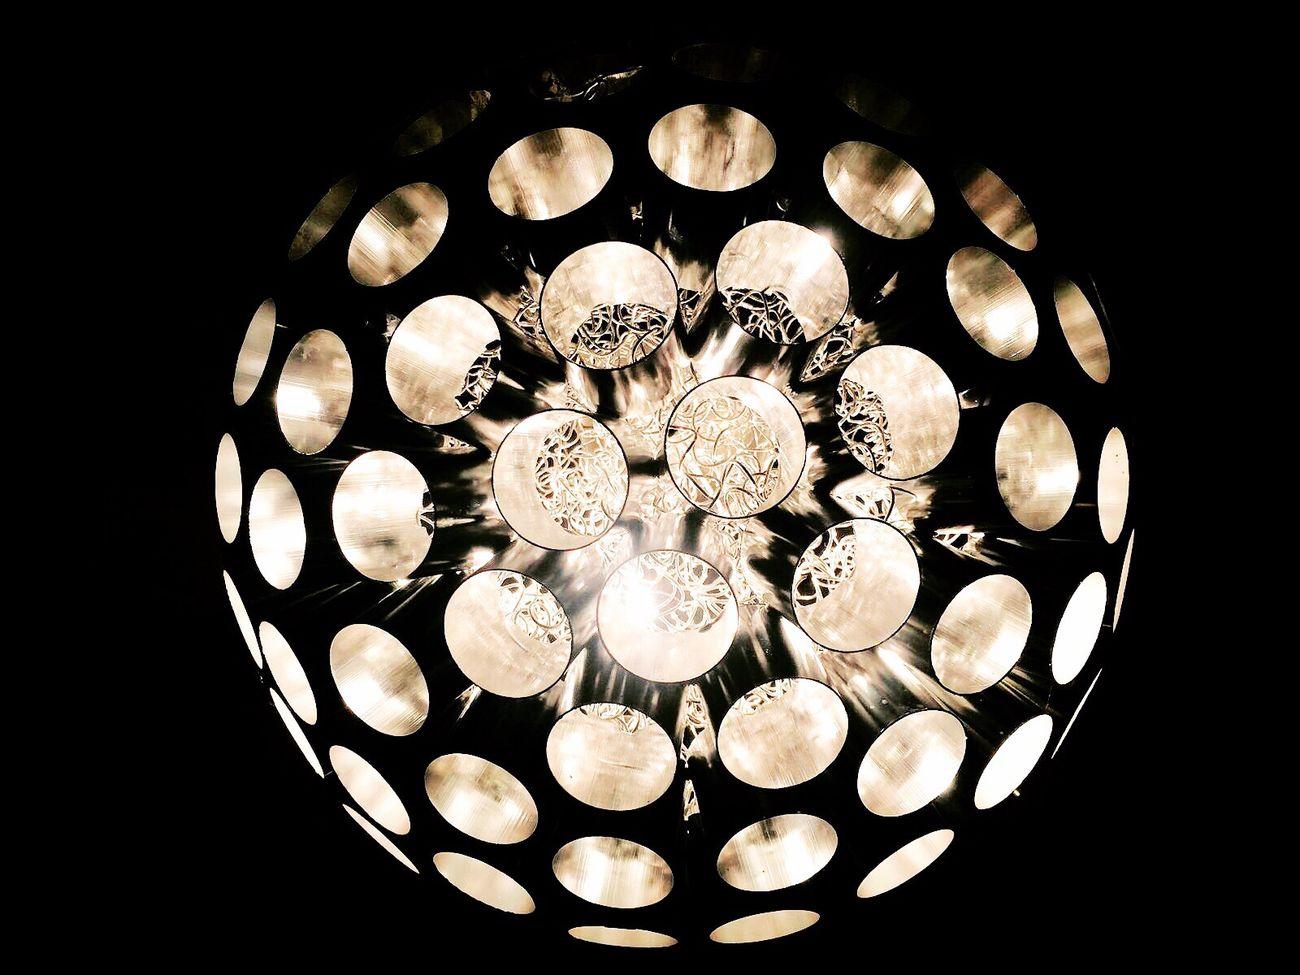 Maledettolampadario No People Black Background Photography Creativity Atmospheric Mood Darkroom Lighting Equipment Lights Lightseffect Direct View